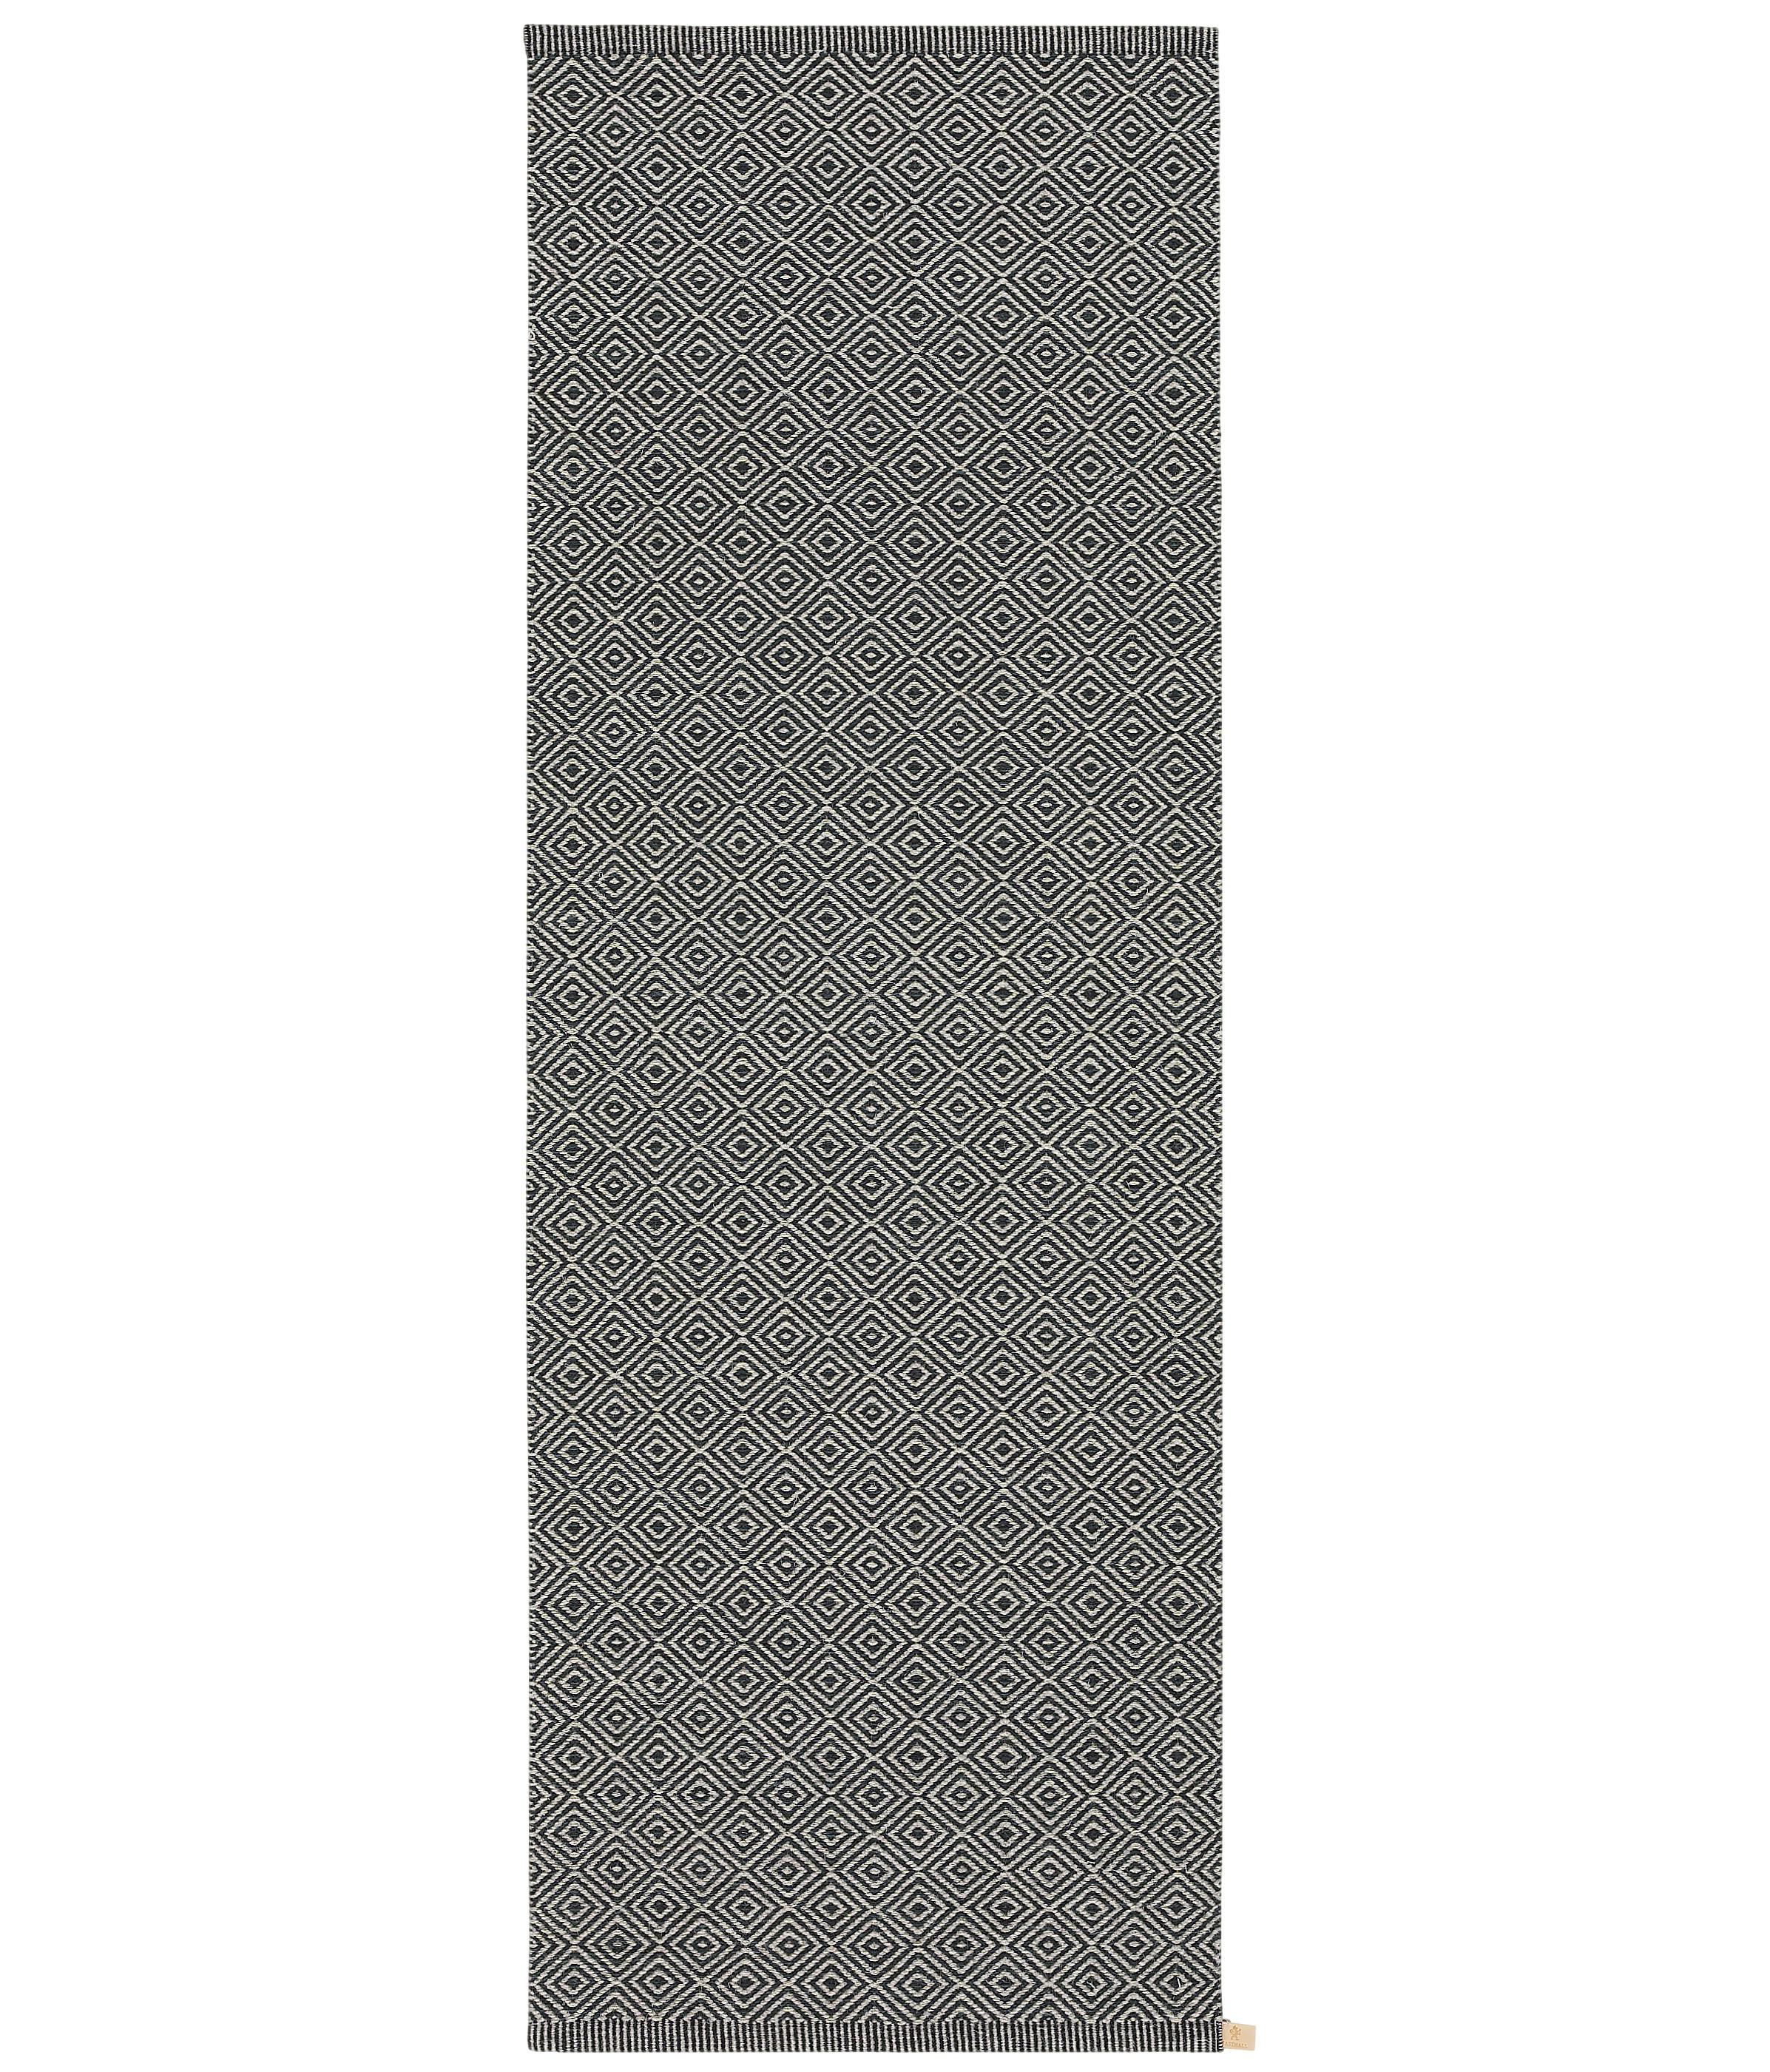 Kasthall Goose Eye Icon häggå goose eye | almost black-light natural grey 9537-5006